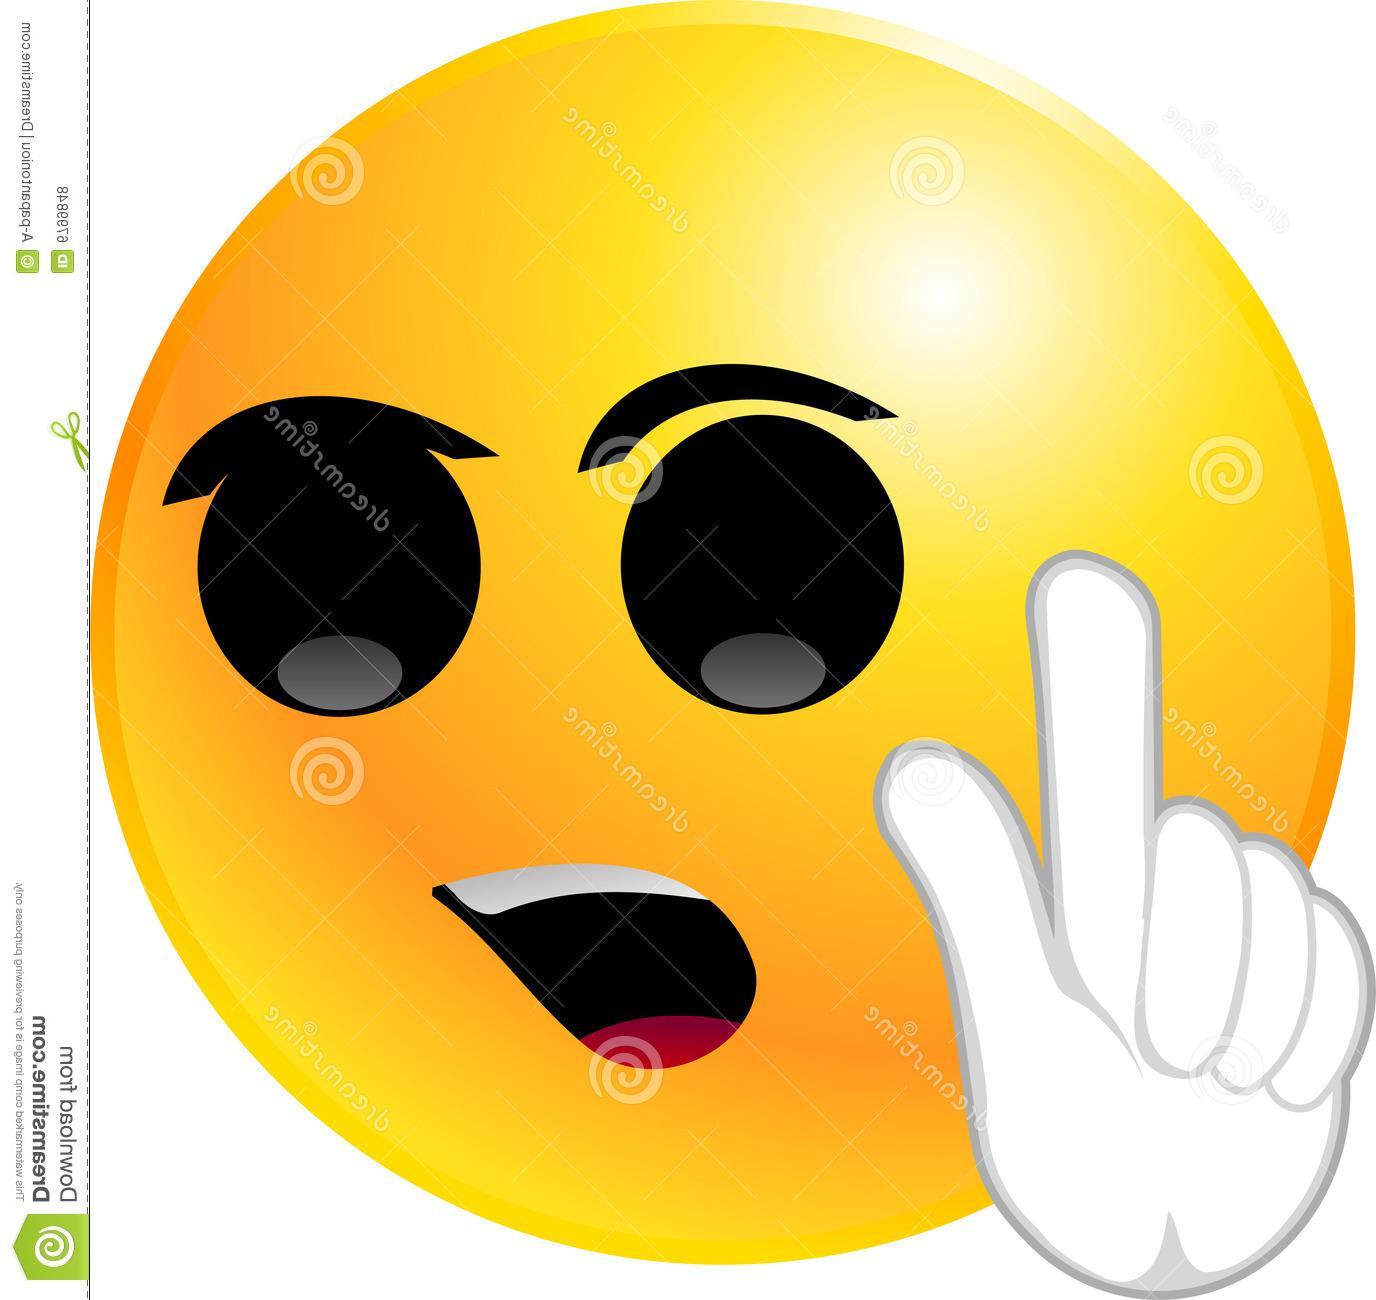 1376x1300 Best 15 Emotion Clip Art Emoticon Smiley Face Photos